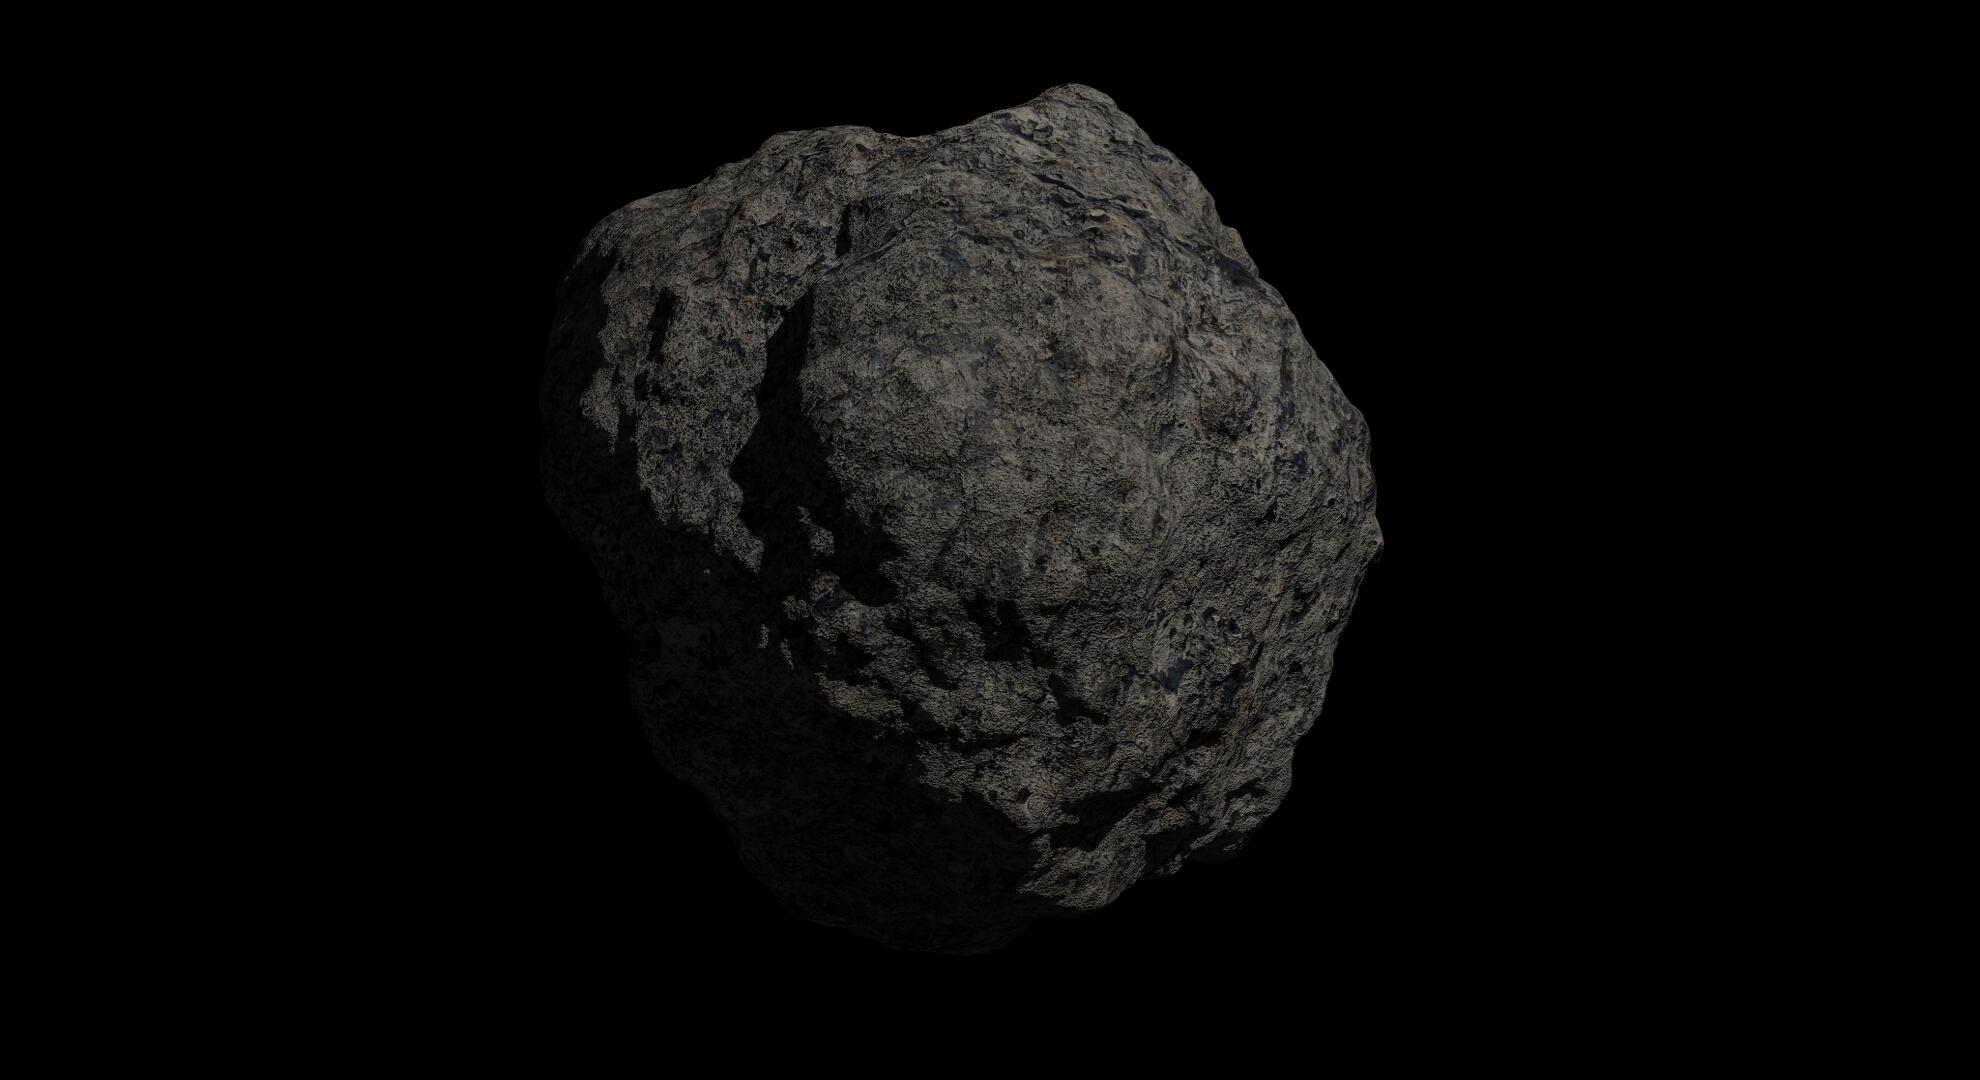 fantasy asteroid 2 3d model 3ds blend dae fbx obj 267201